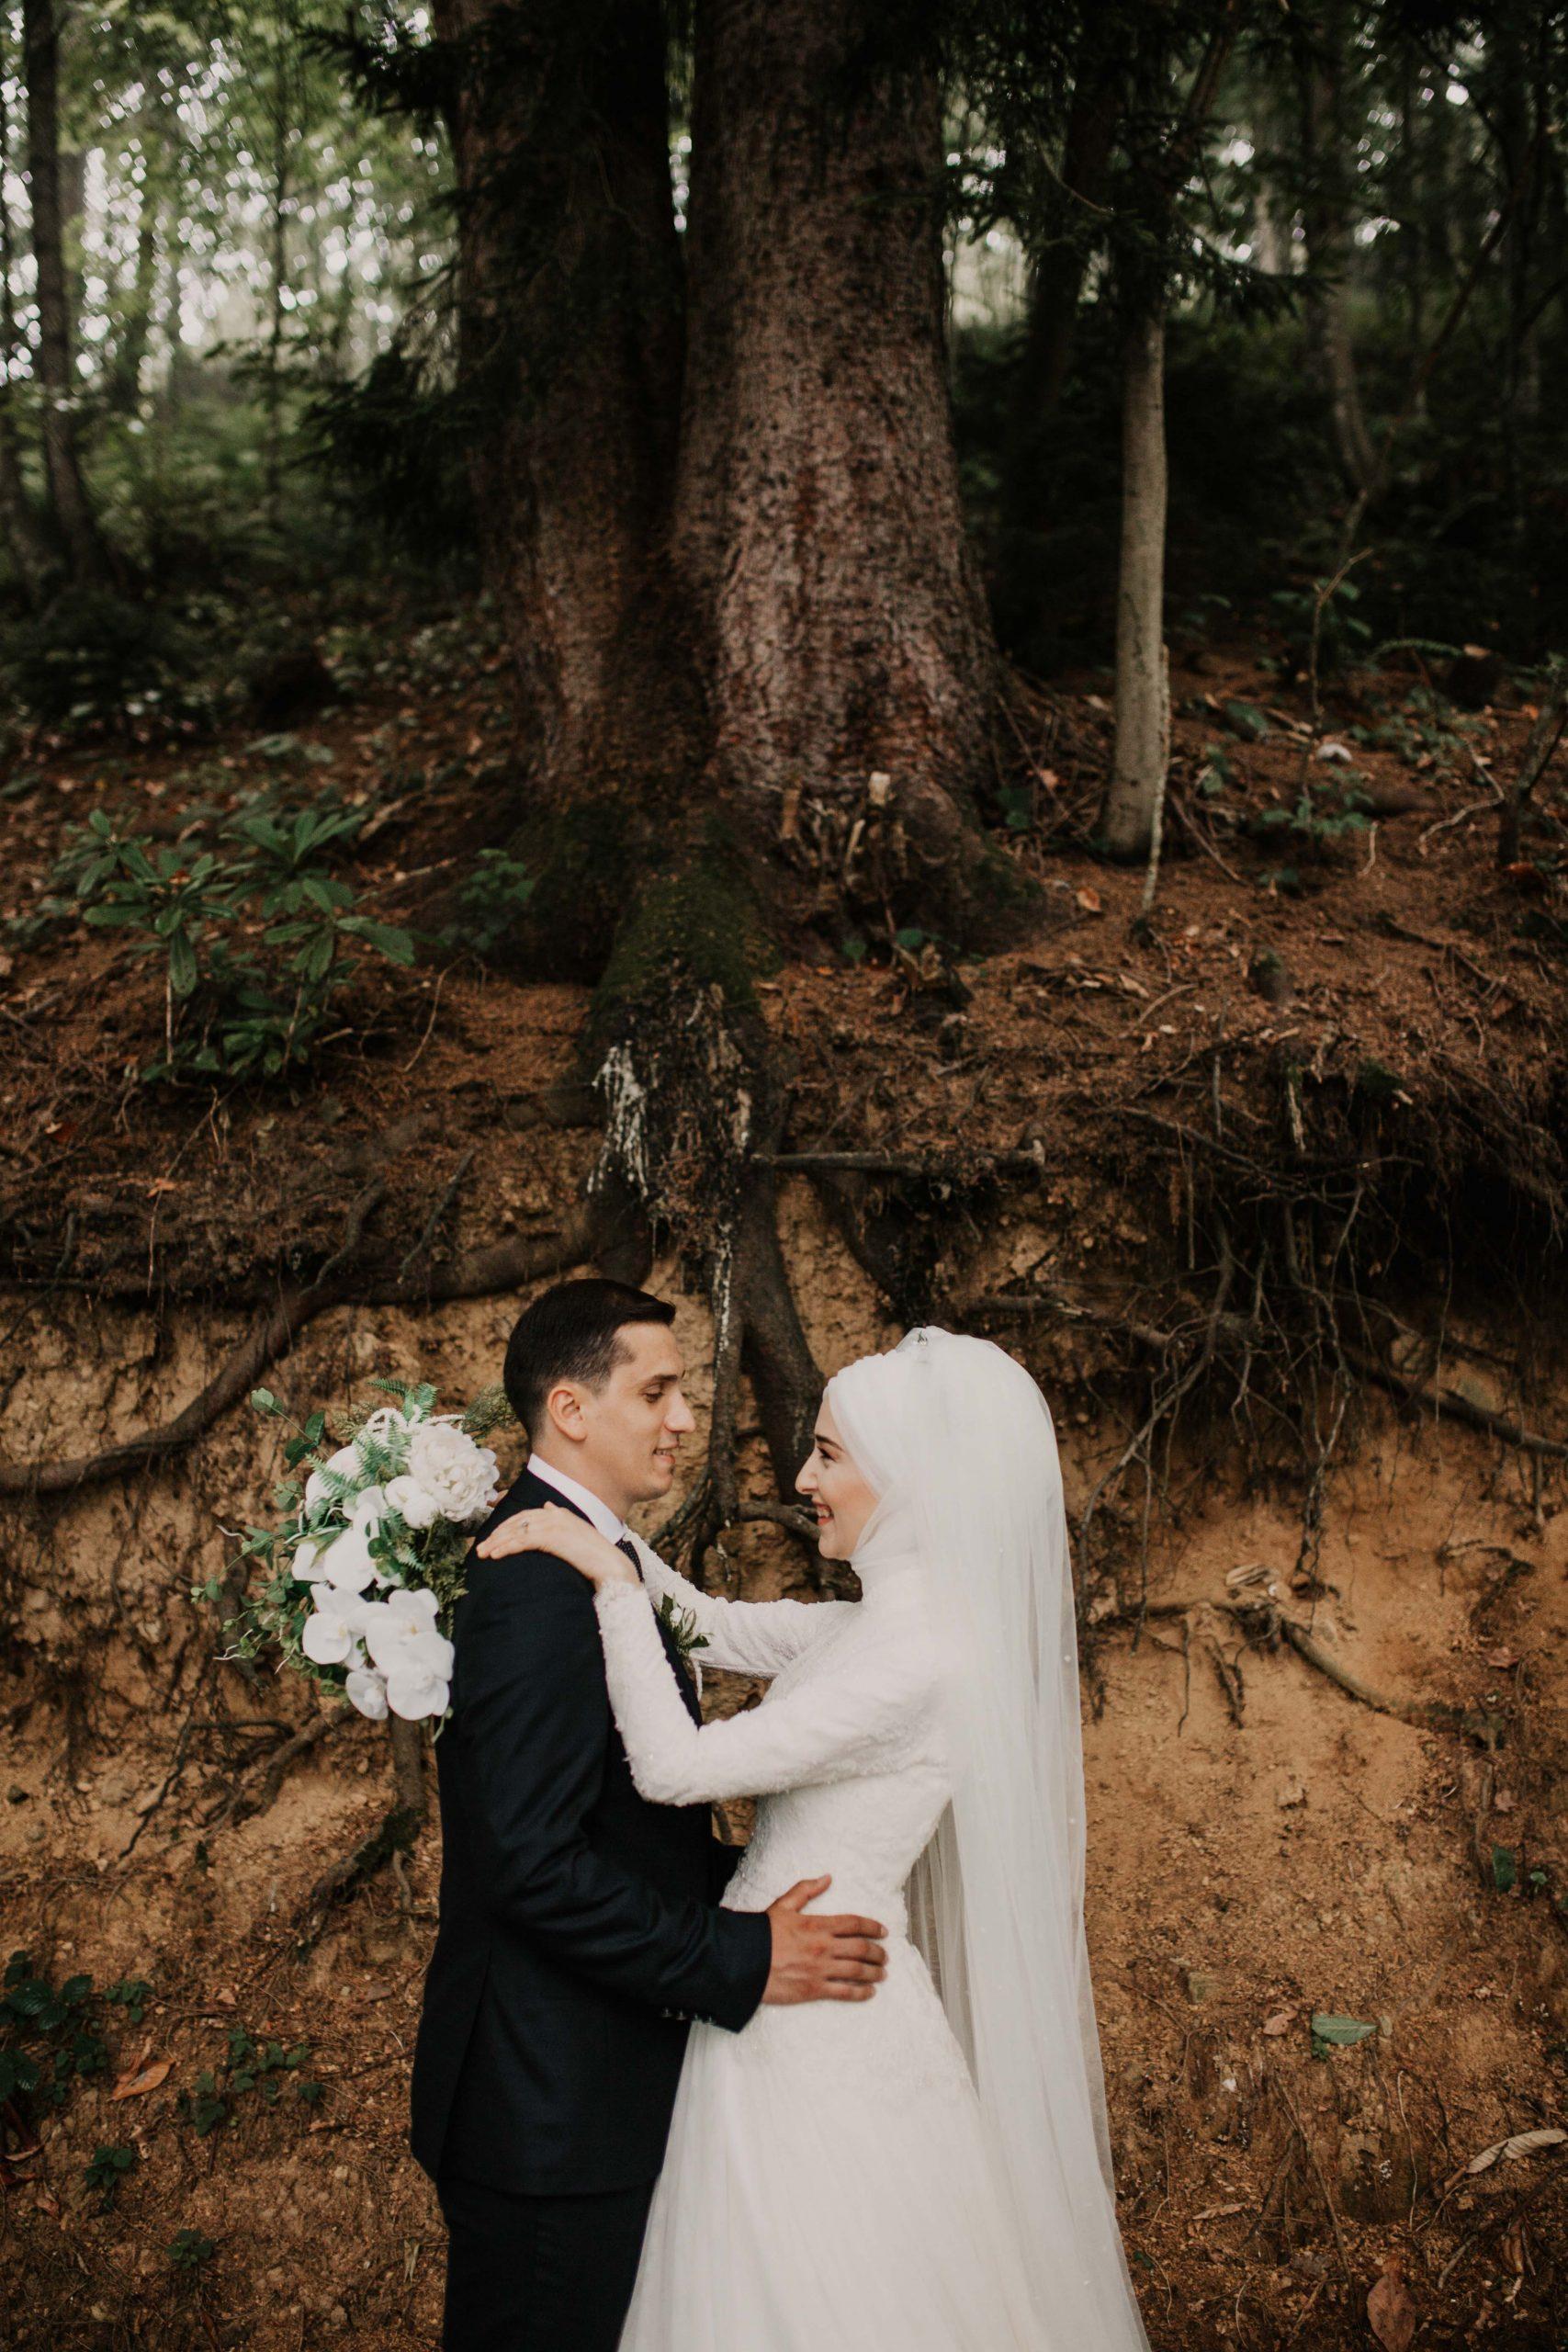 Trabzon Düğün Fotoğrafları